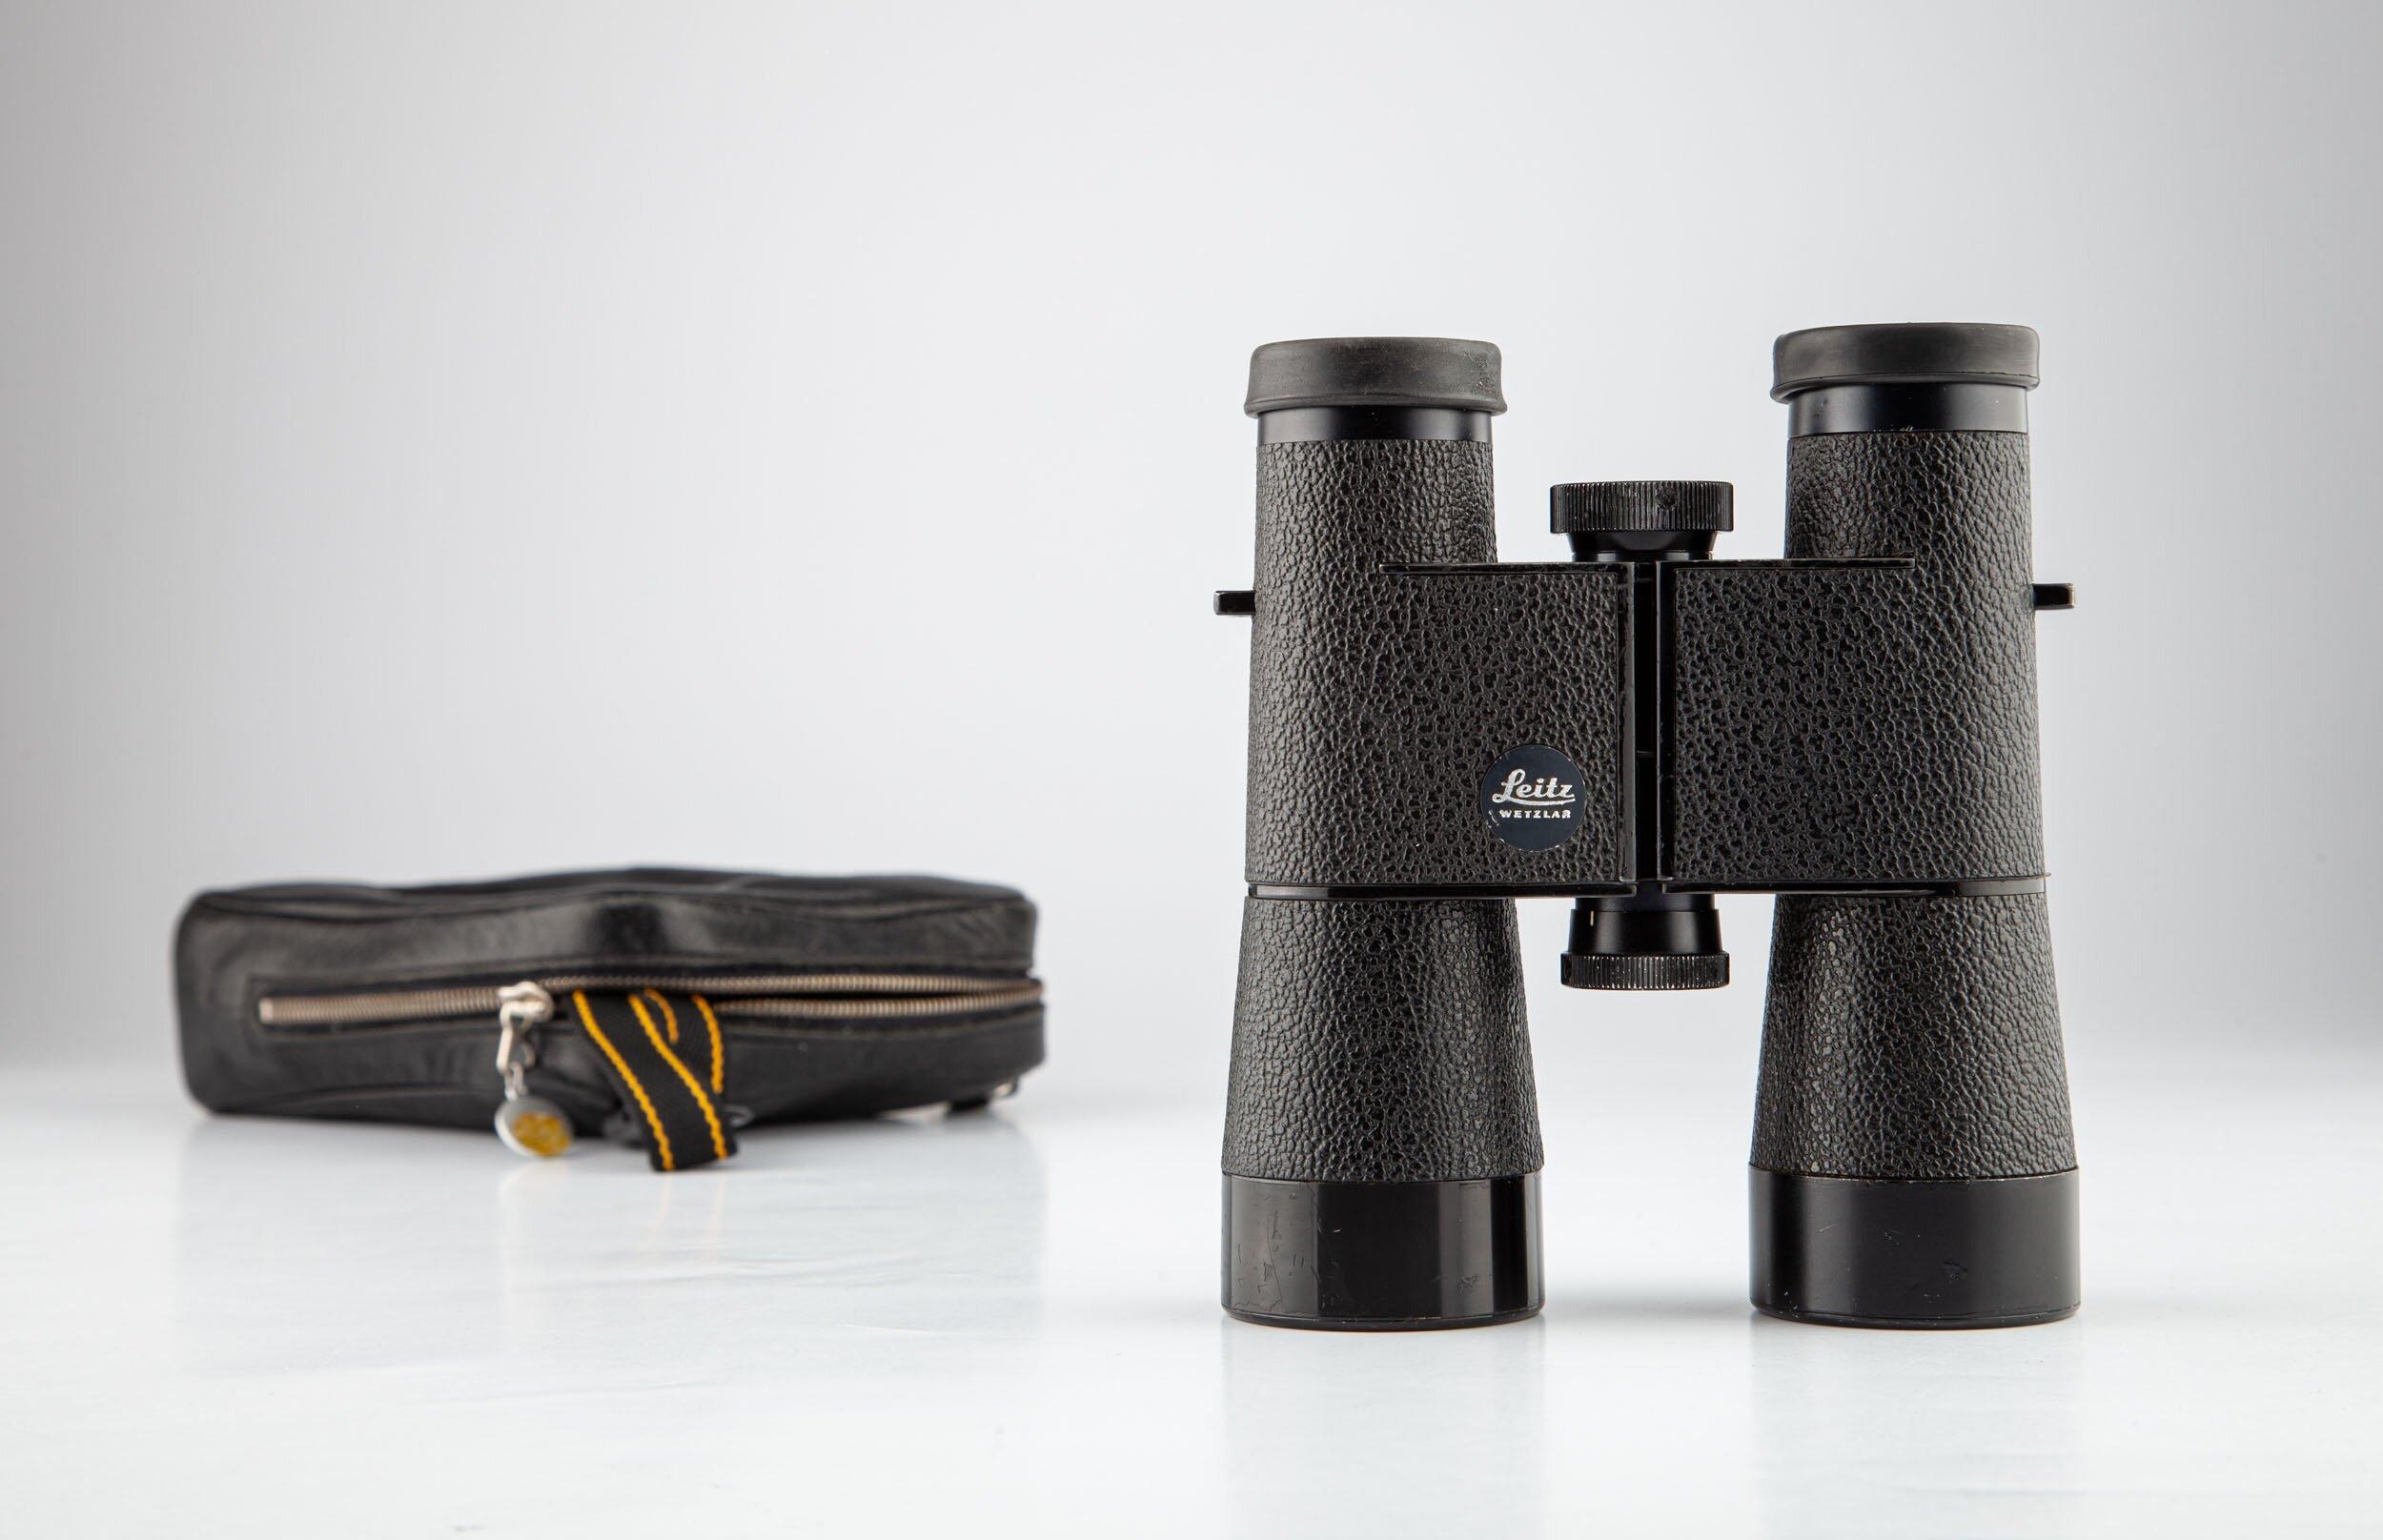 Leitz Leica Trinovid 8x40 Binocolar Black